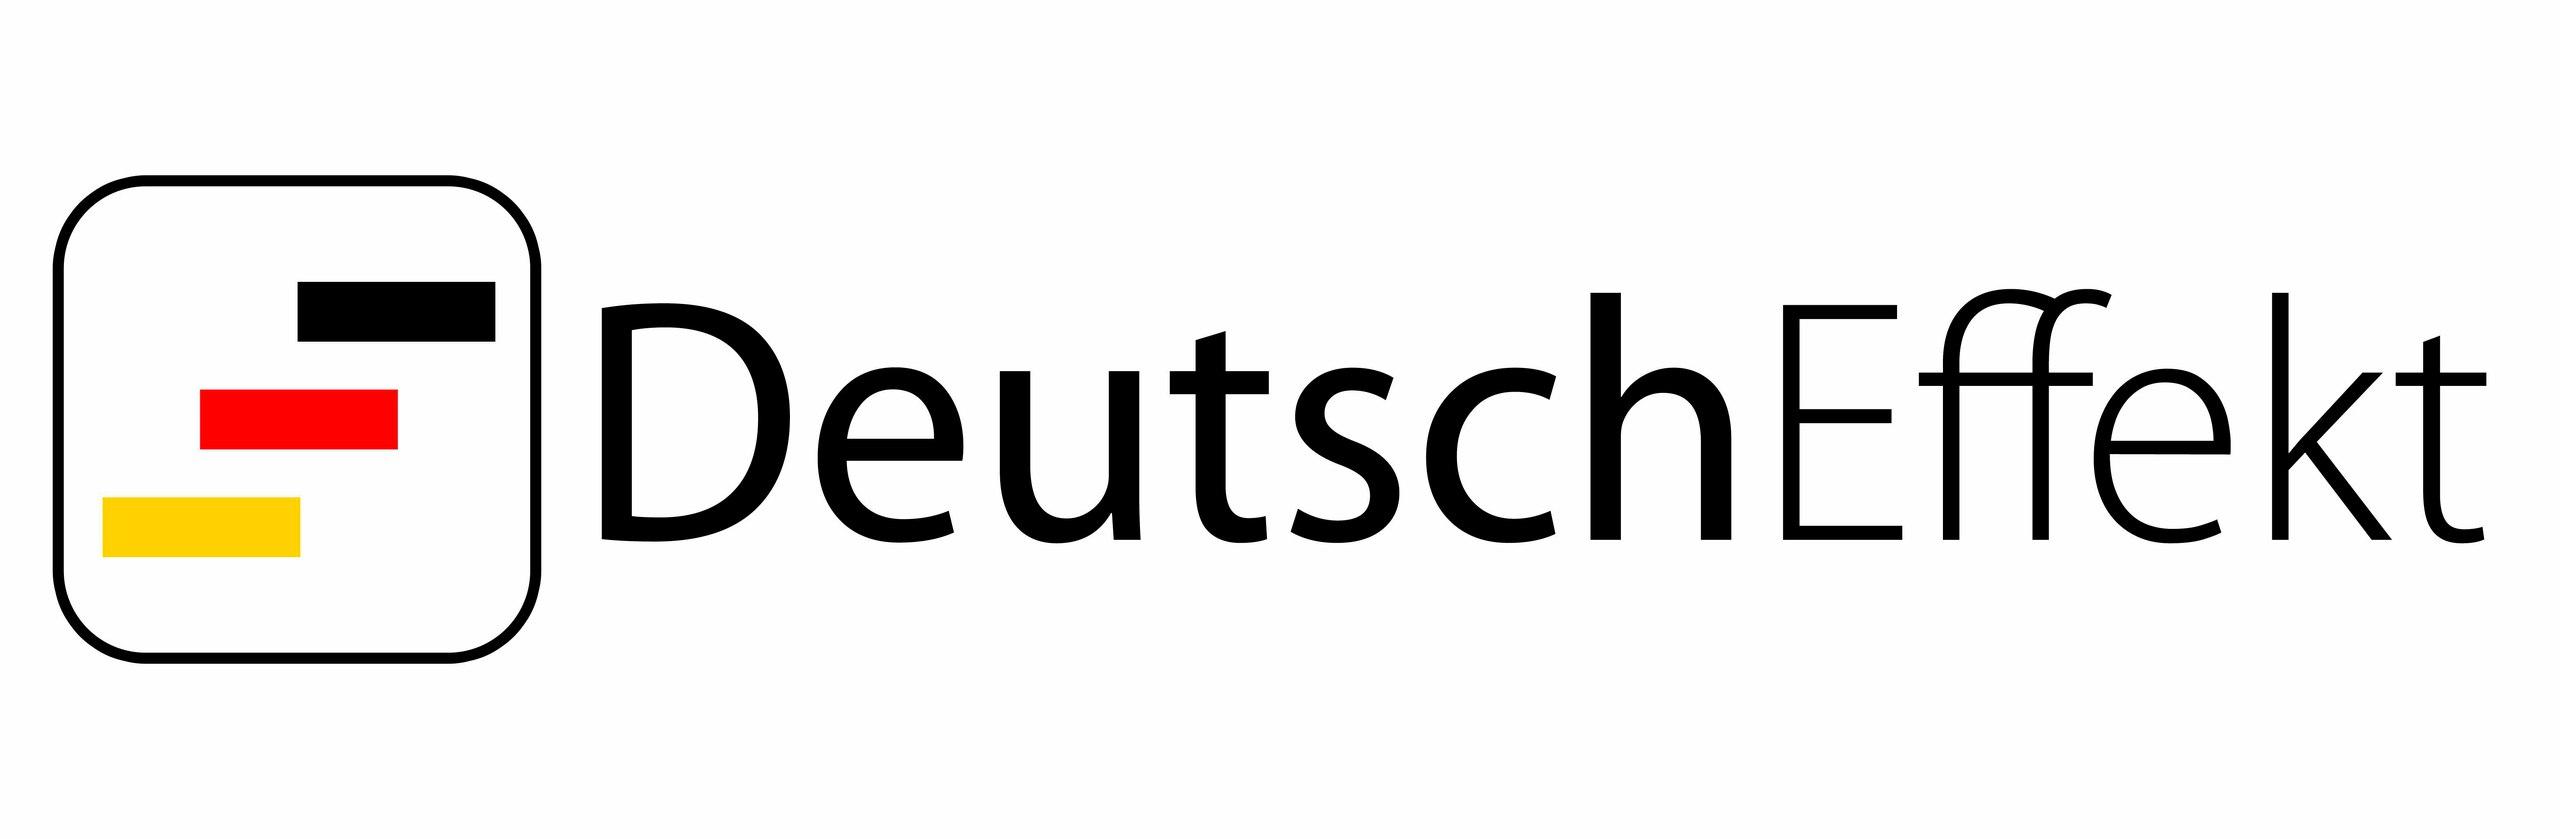 курсы немецкого языка deutsch zentrum москва